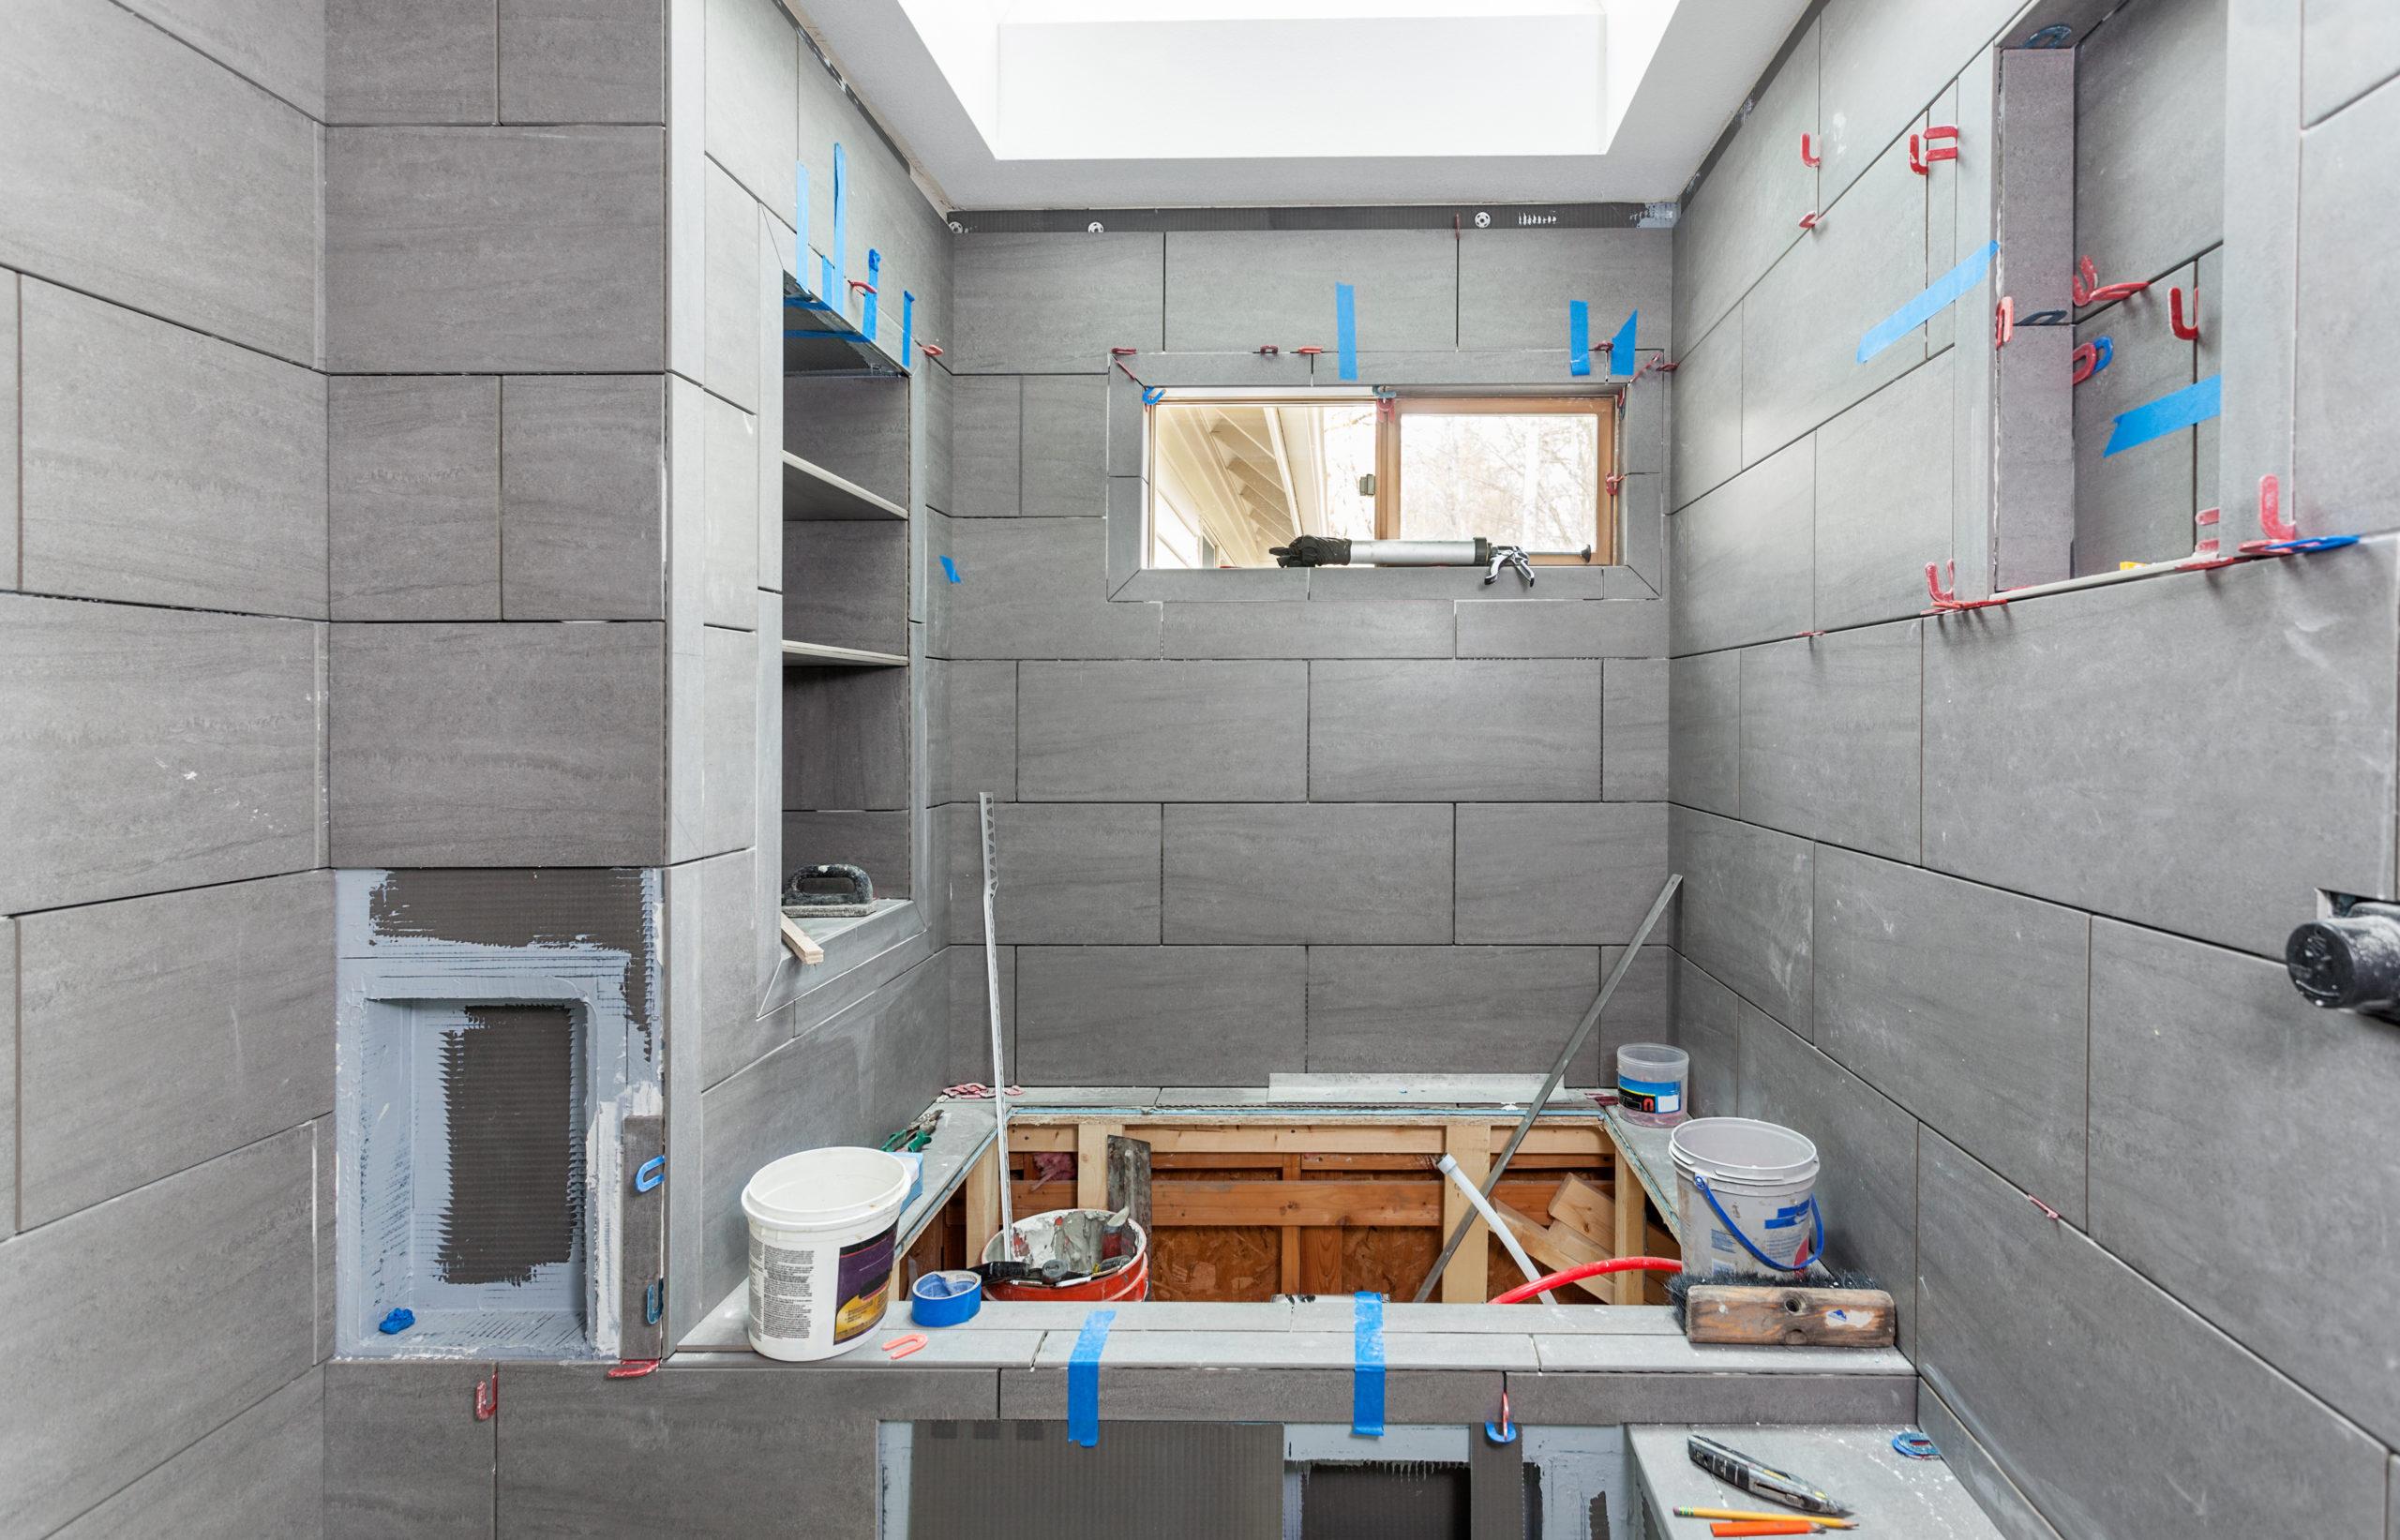 bathtub resurfacing costs